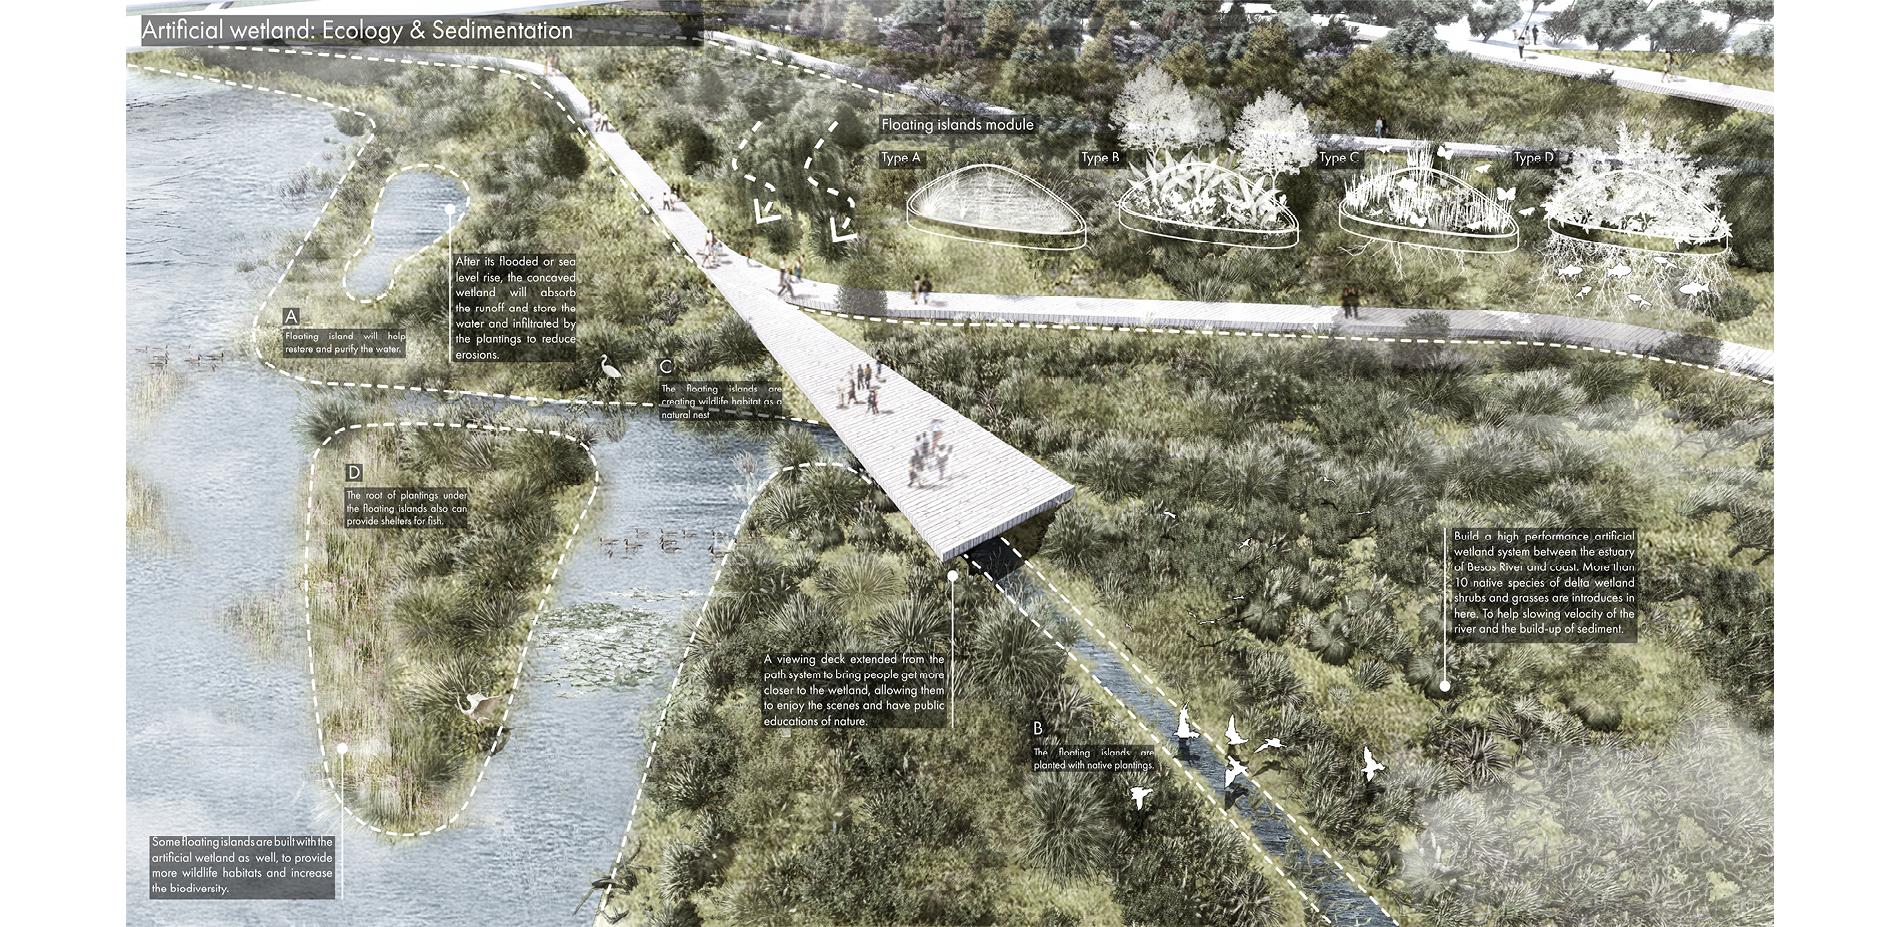 Artificial Wetland: Ecology & Sedimentation